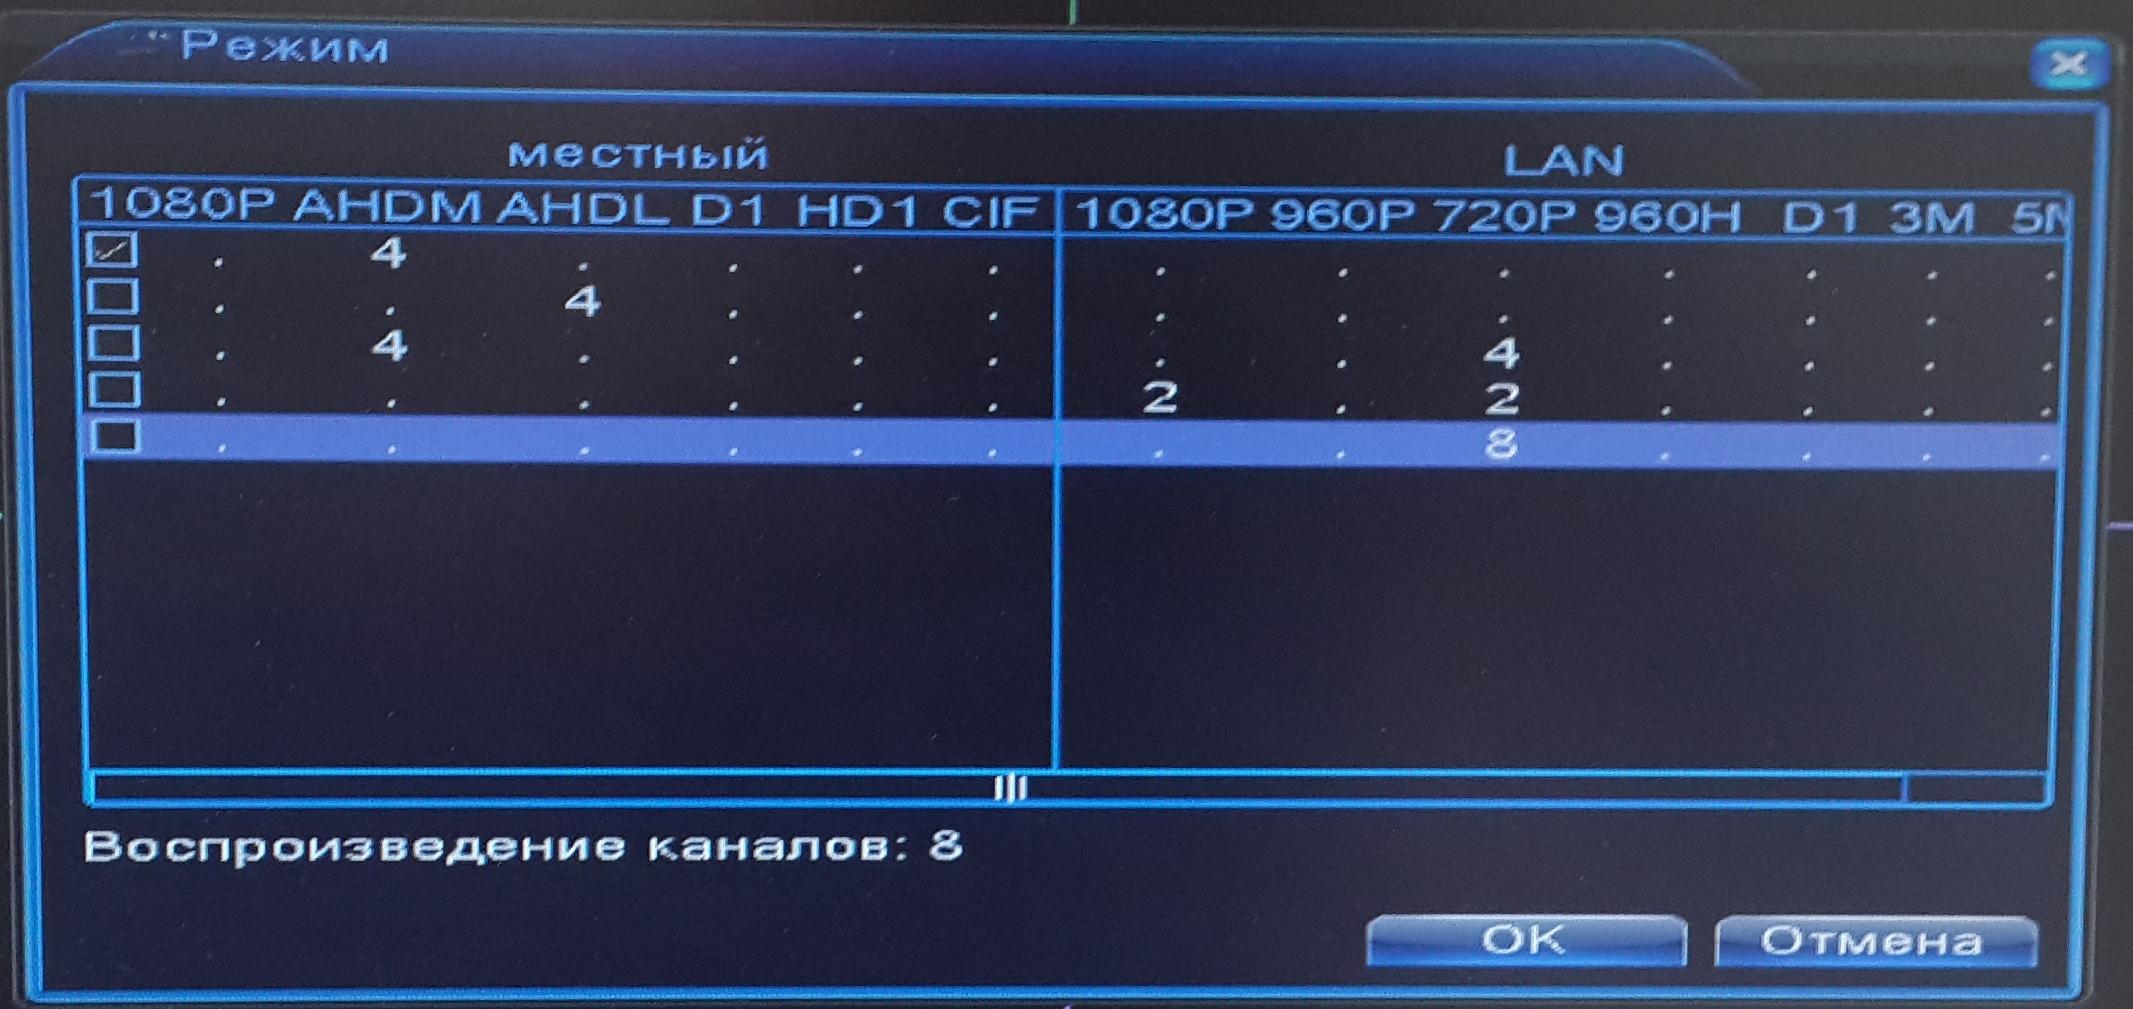 Таблица каналов ADR-3300HD